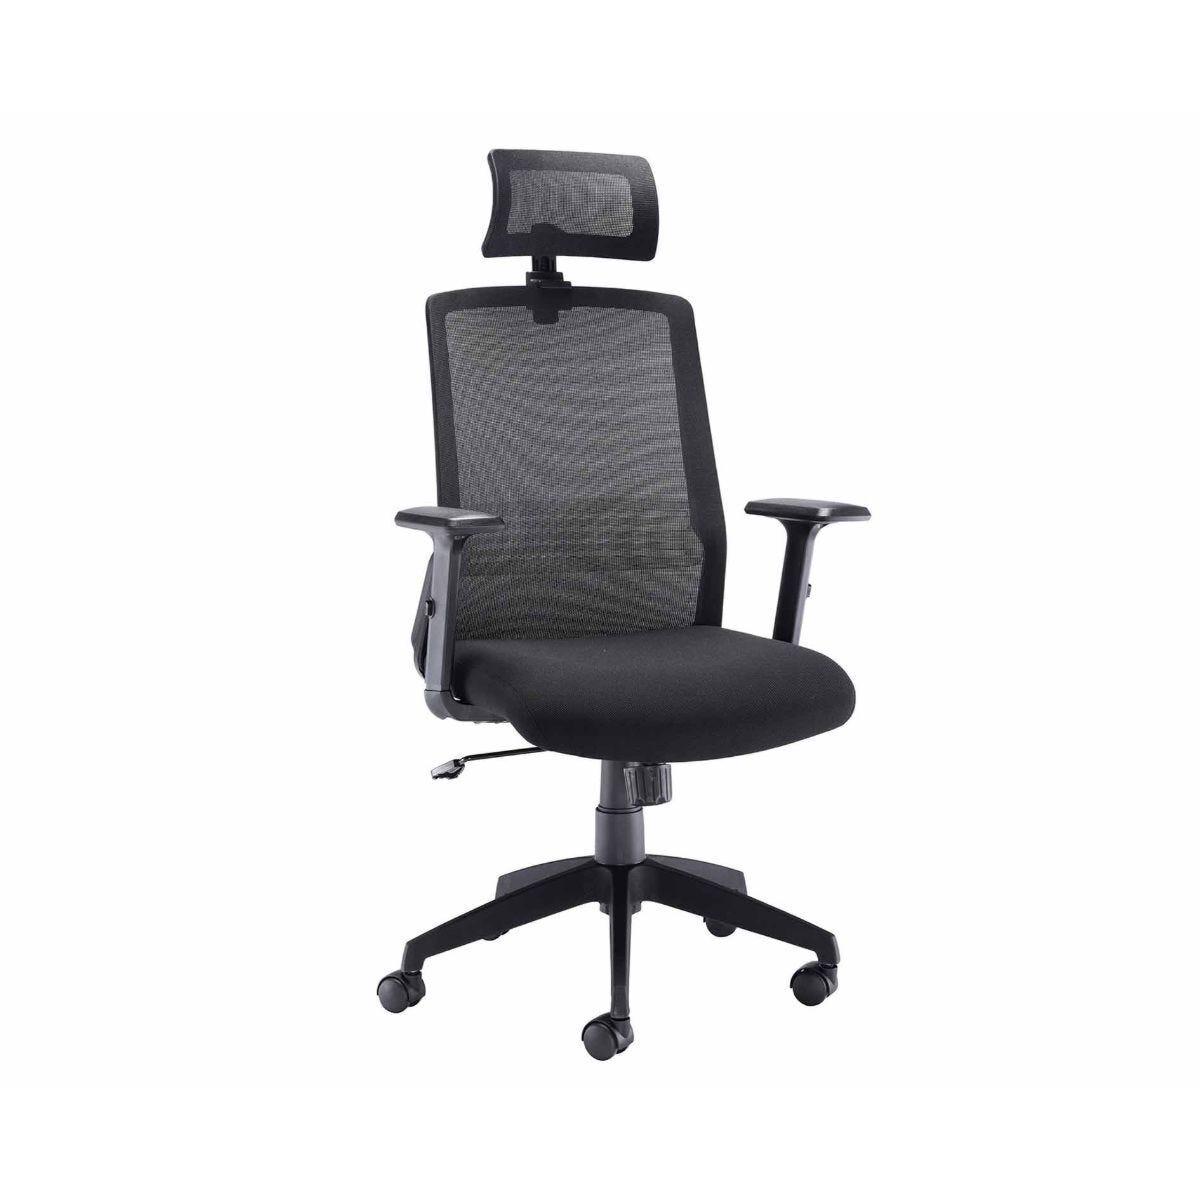 TC Office Denali High Back Mesh Task Chair with Headrest